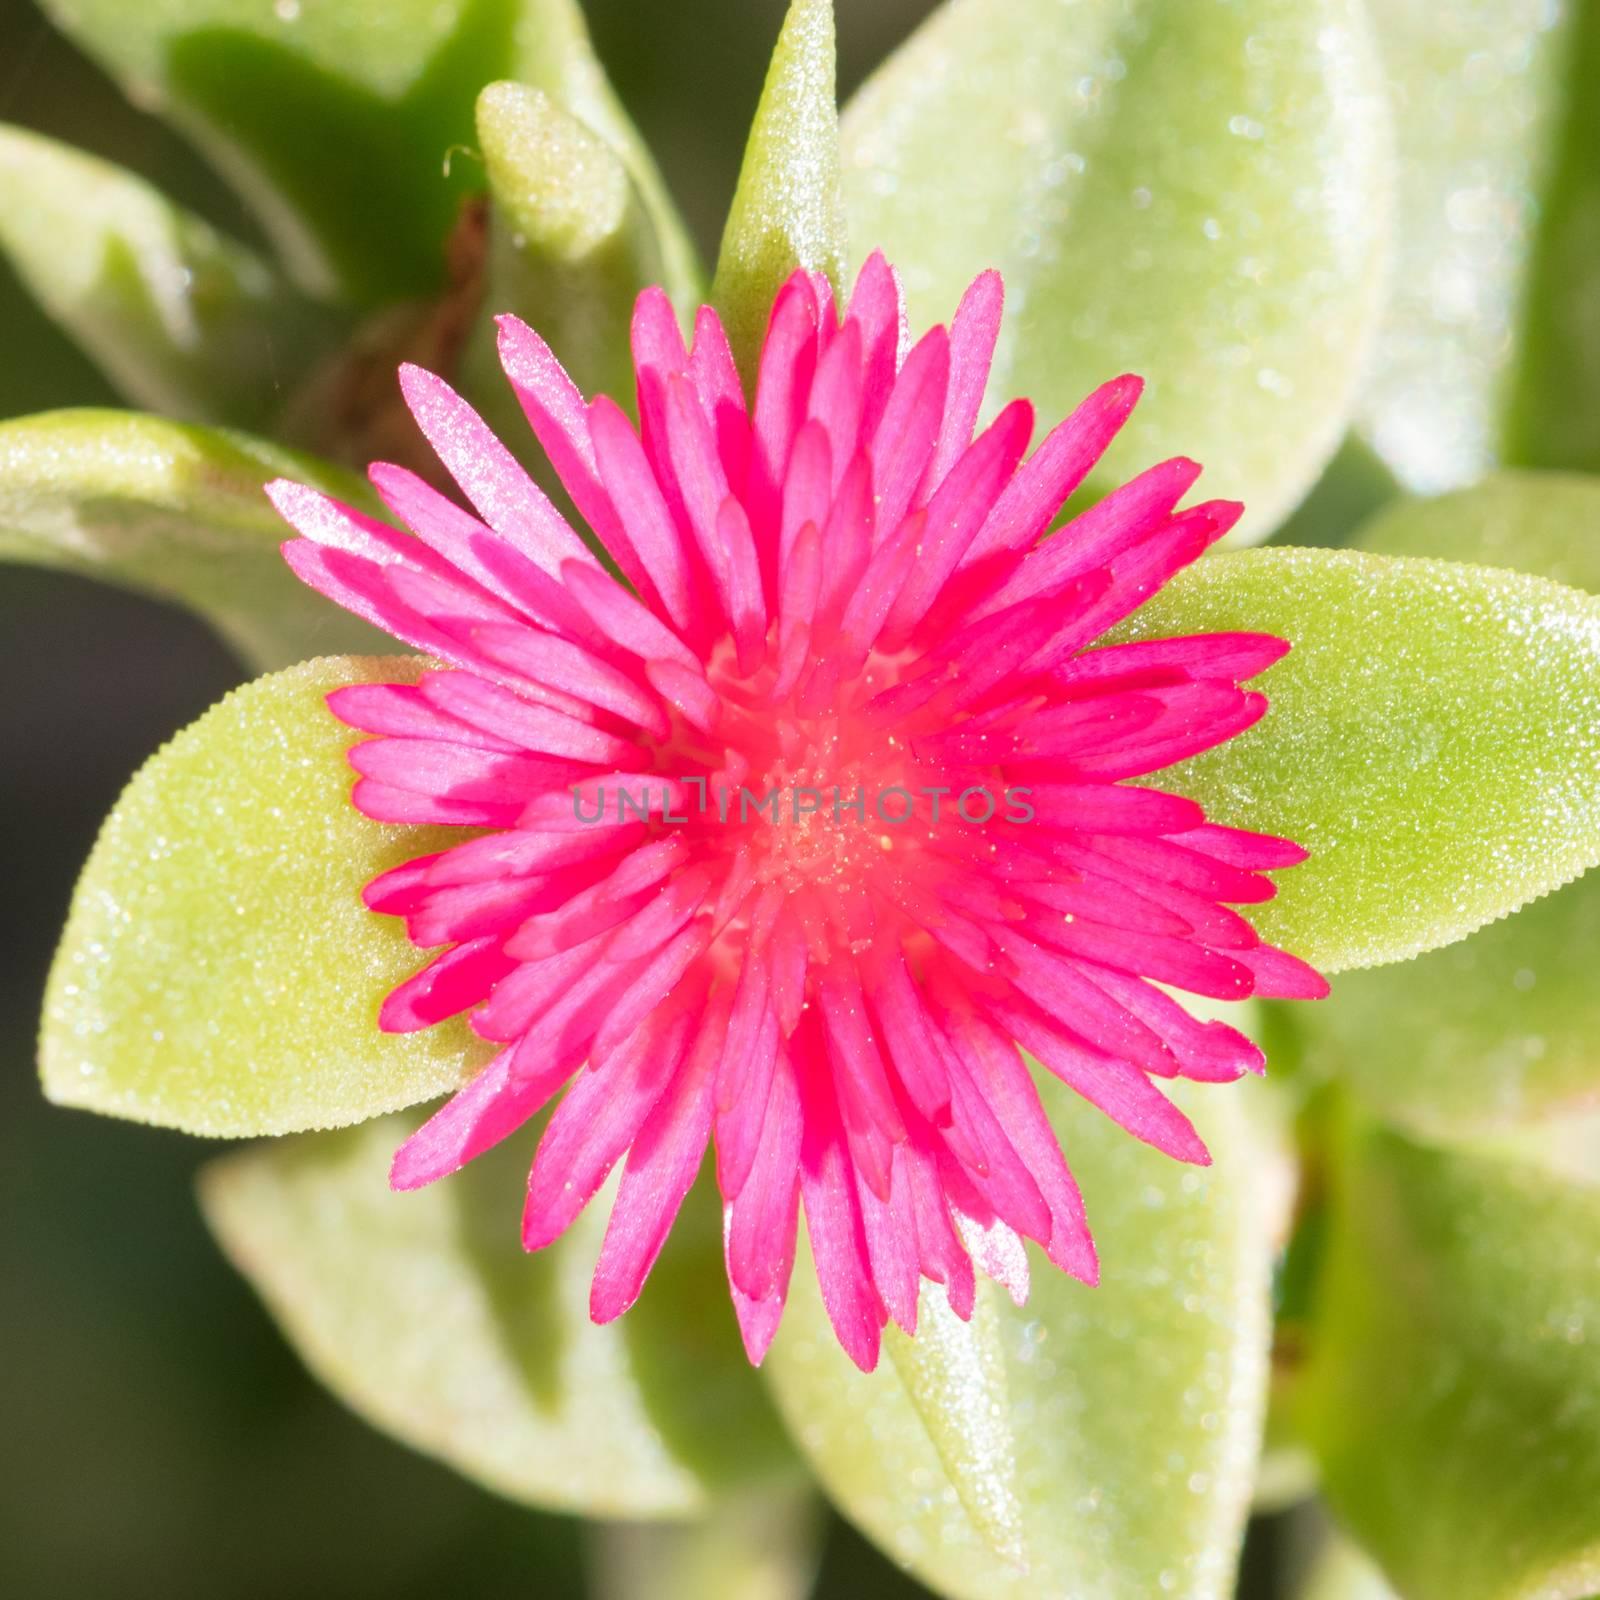 Flower in the summer - Garden in Greece